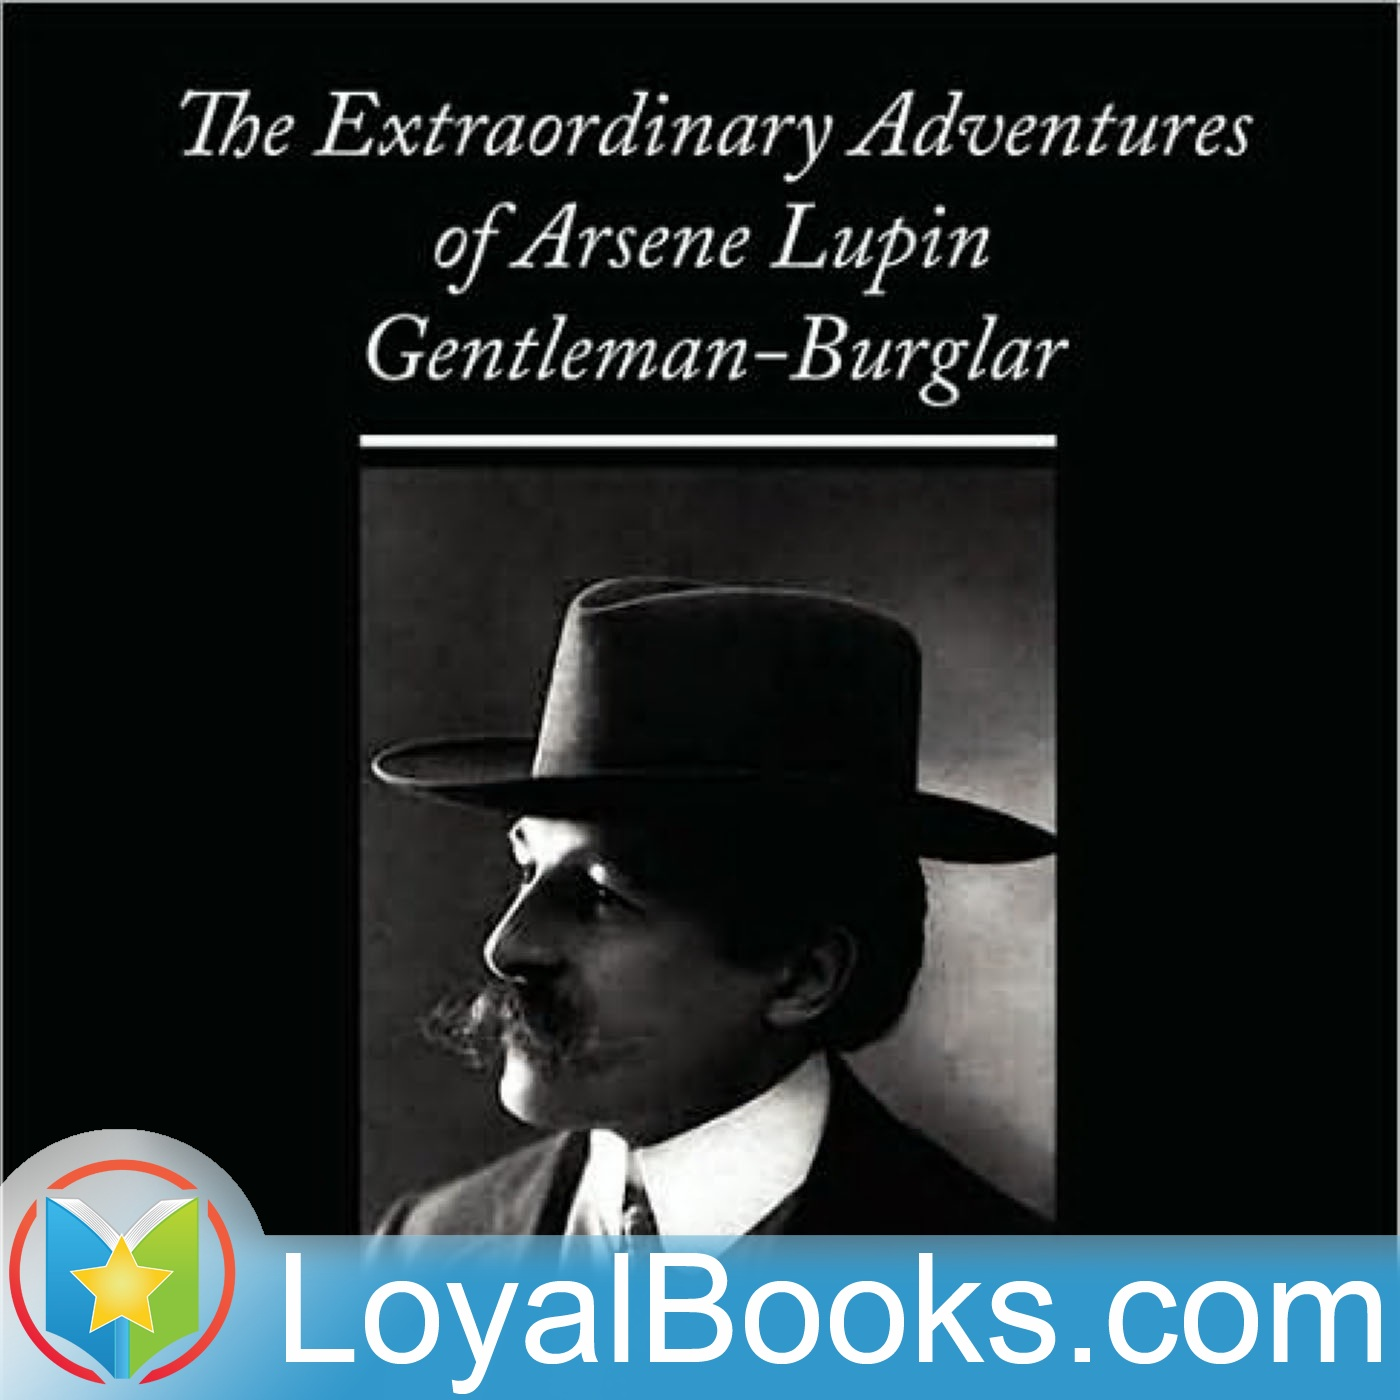 <![CDATA[The Extraordinary Adventures of Arsène Lupin, Gentleman-Burglar by Maurice Leblanc]]>